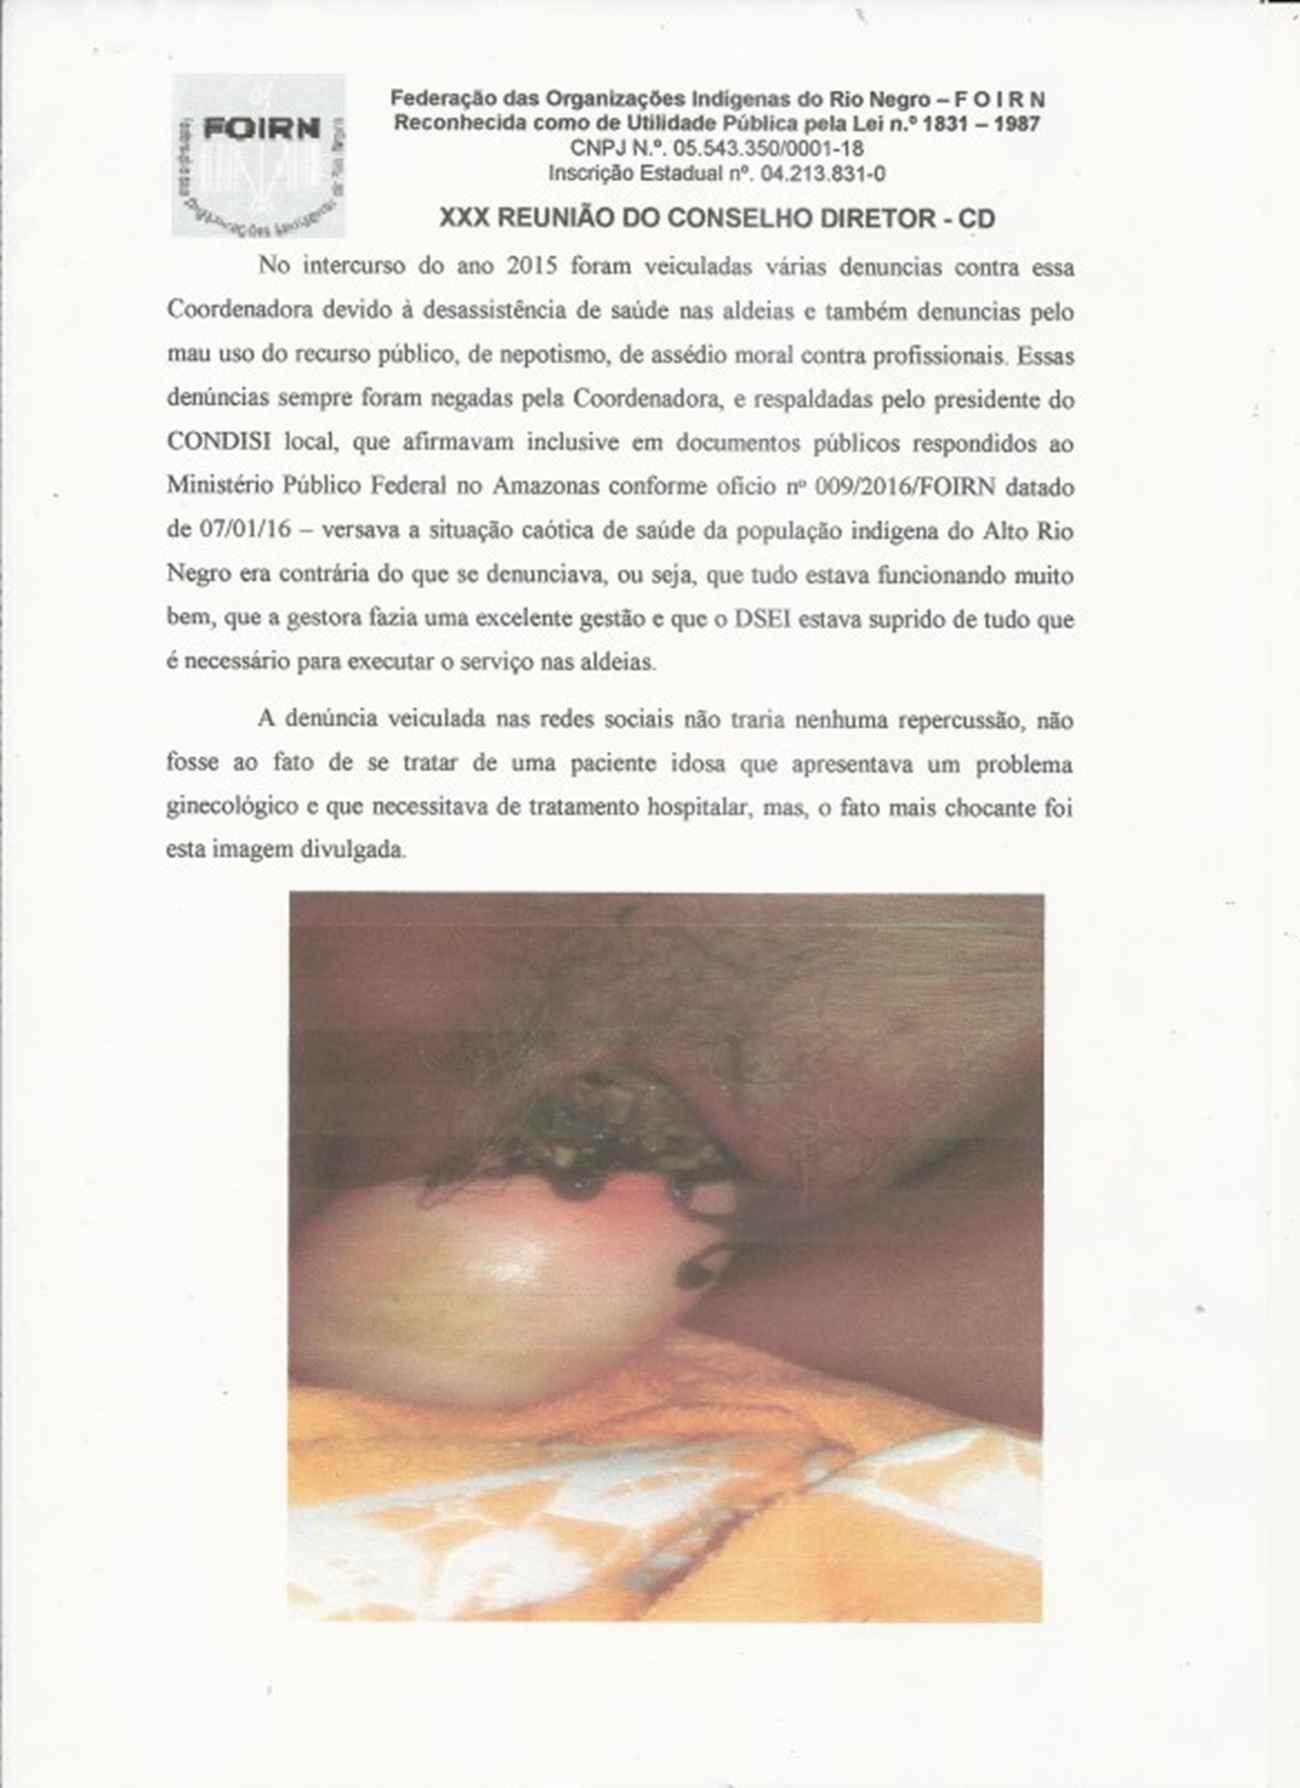 carta-foirn-2